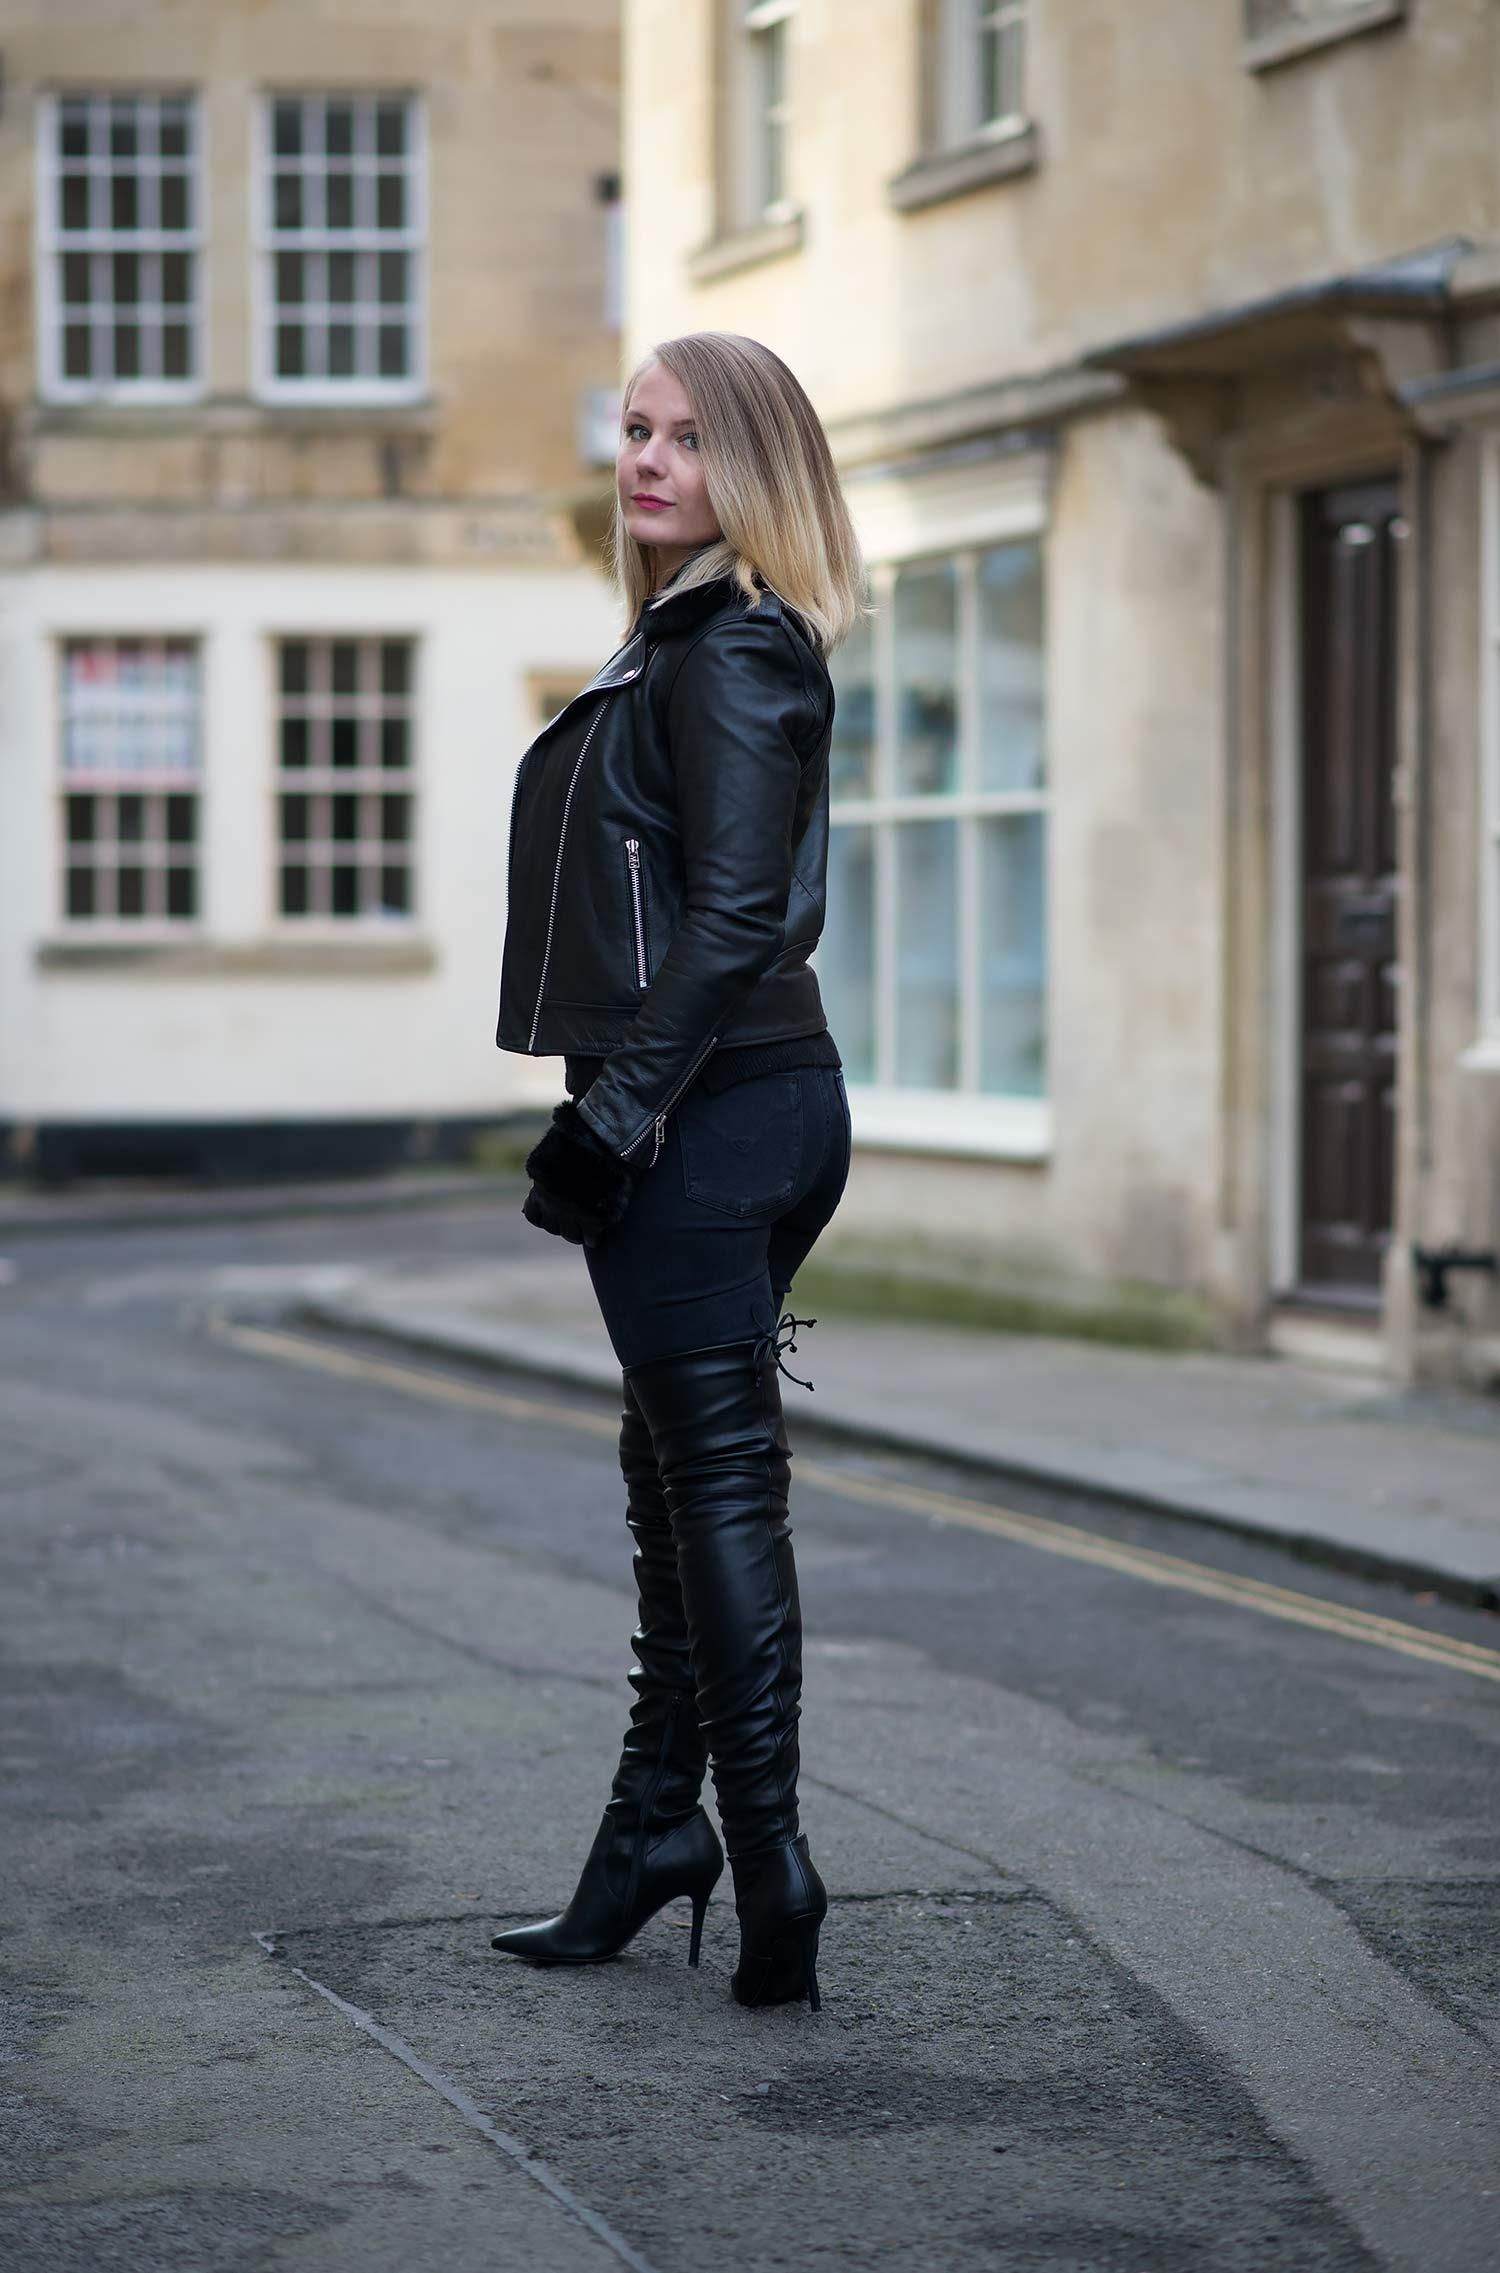 63644a7ac15da lorna burford leather thigh high boots leather jacket fashion blogger